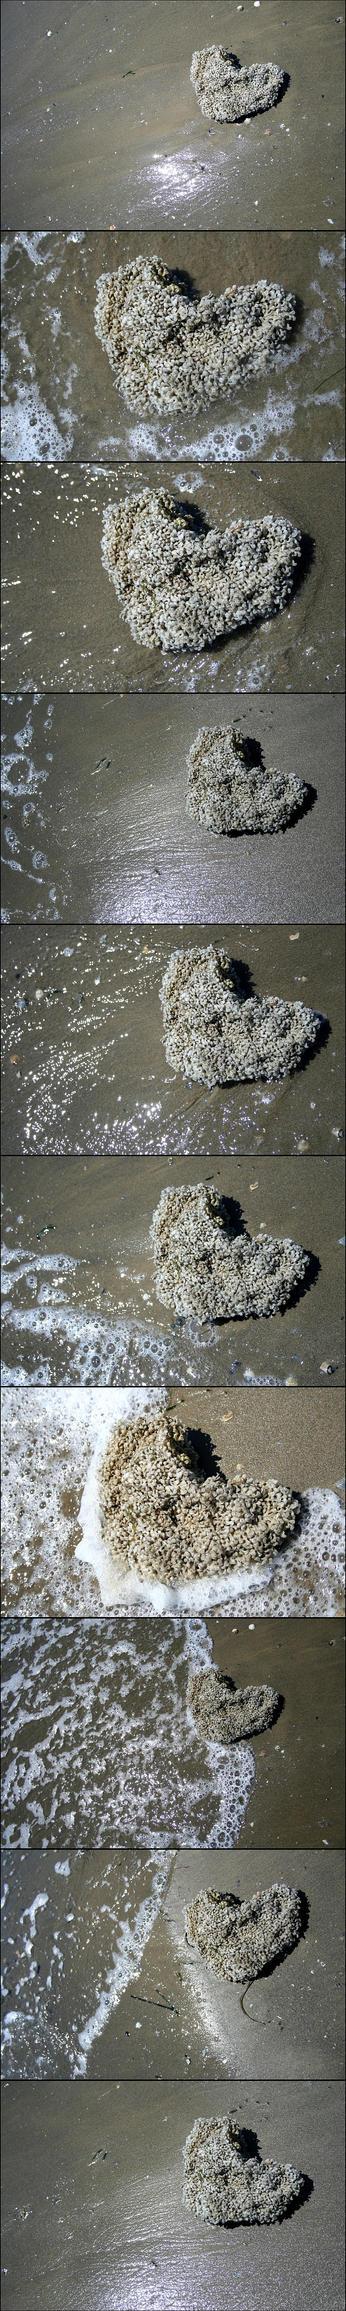 heart on the beach by Belikeme